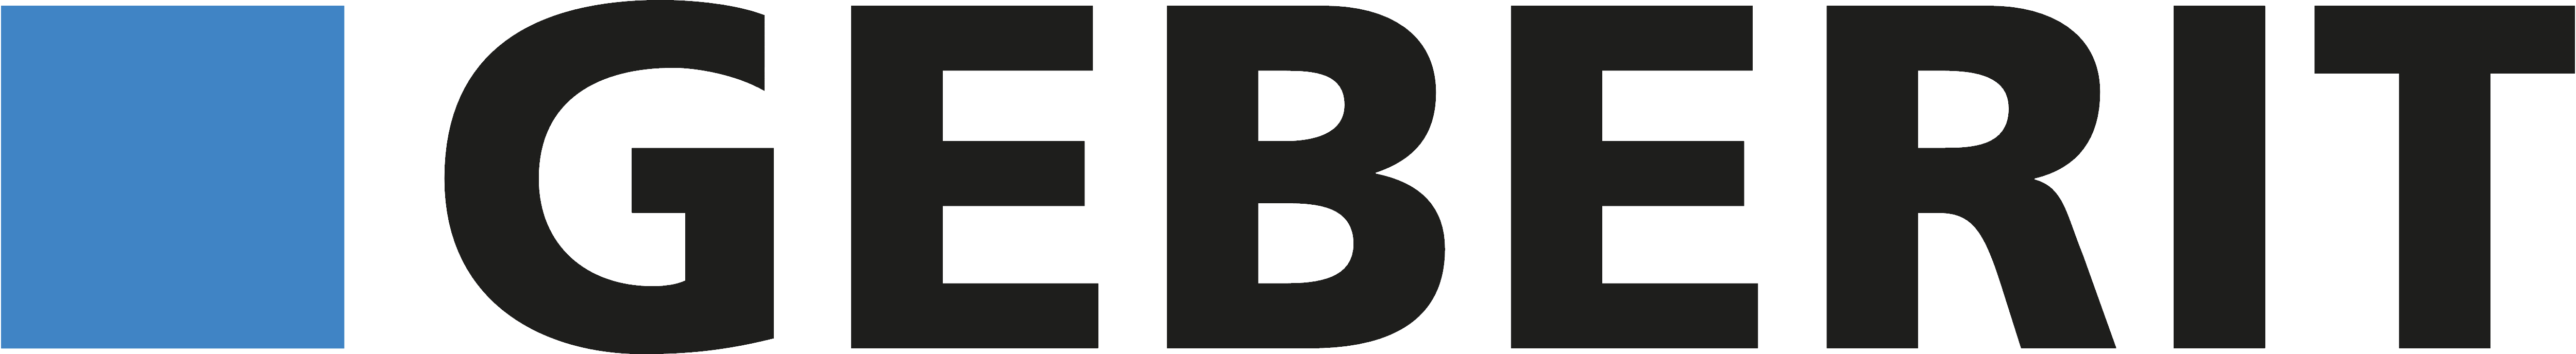 Imagini pentru GEBERIT logo